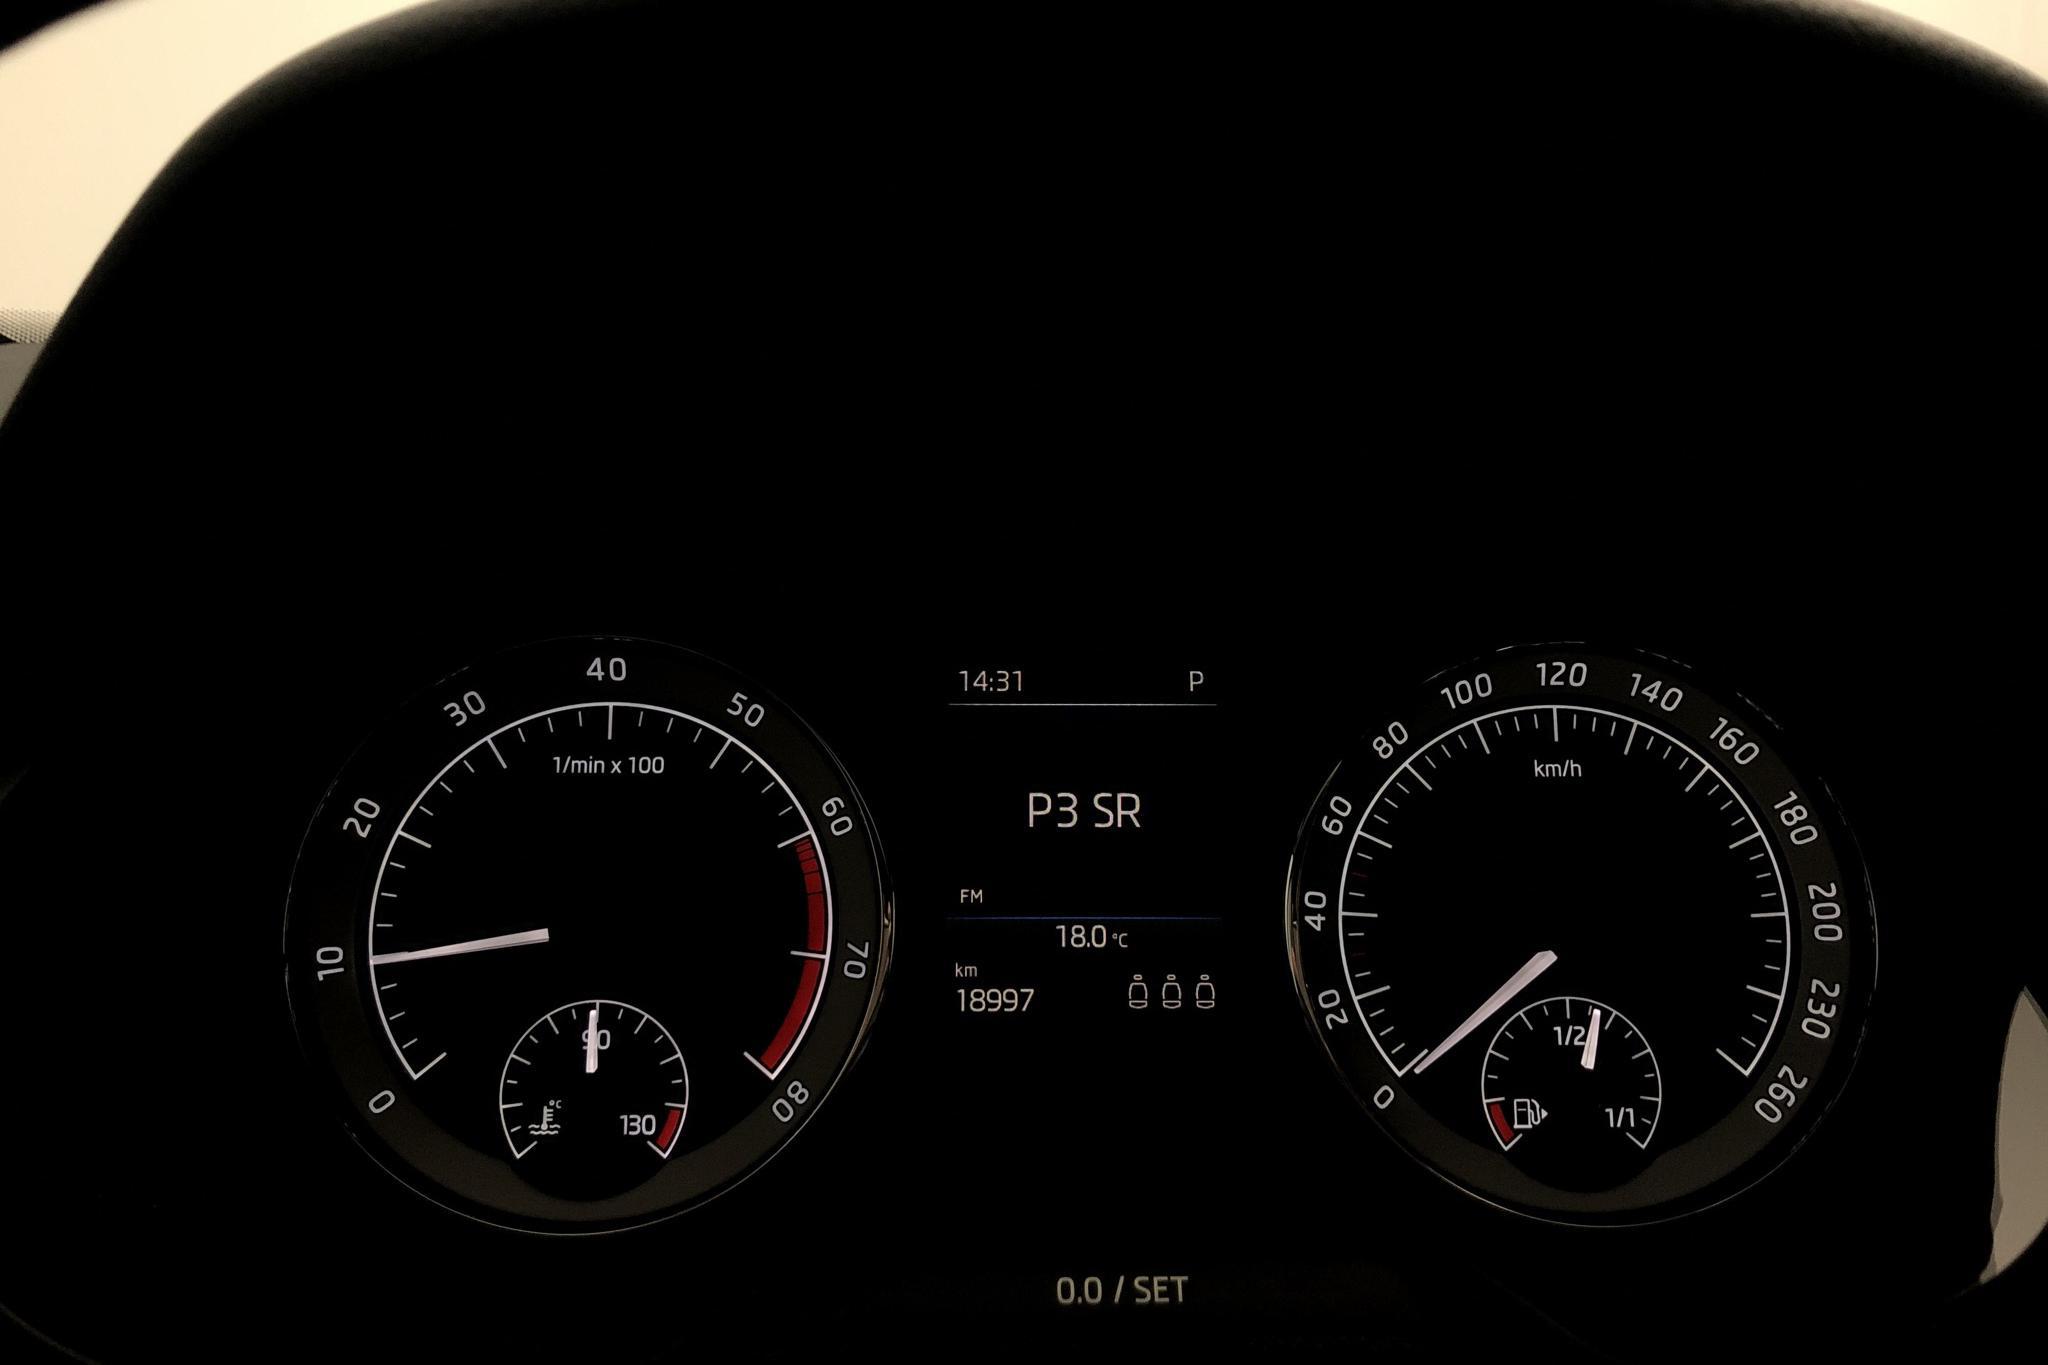 Skoda Octavia III 1.0 TSI Combi (115hk) - 18 970 km - Automatic - white - 2019